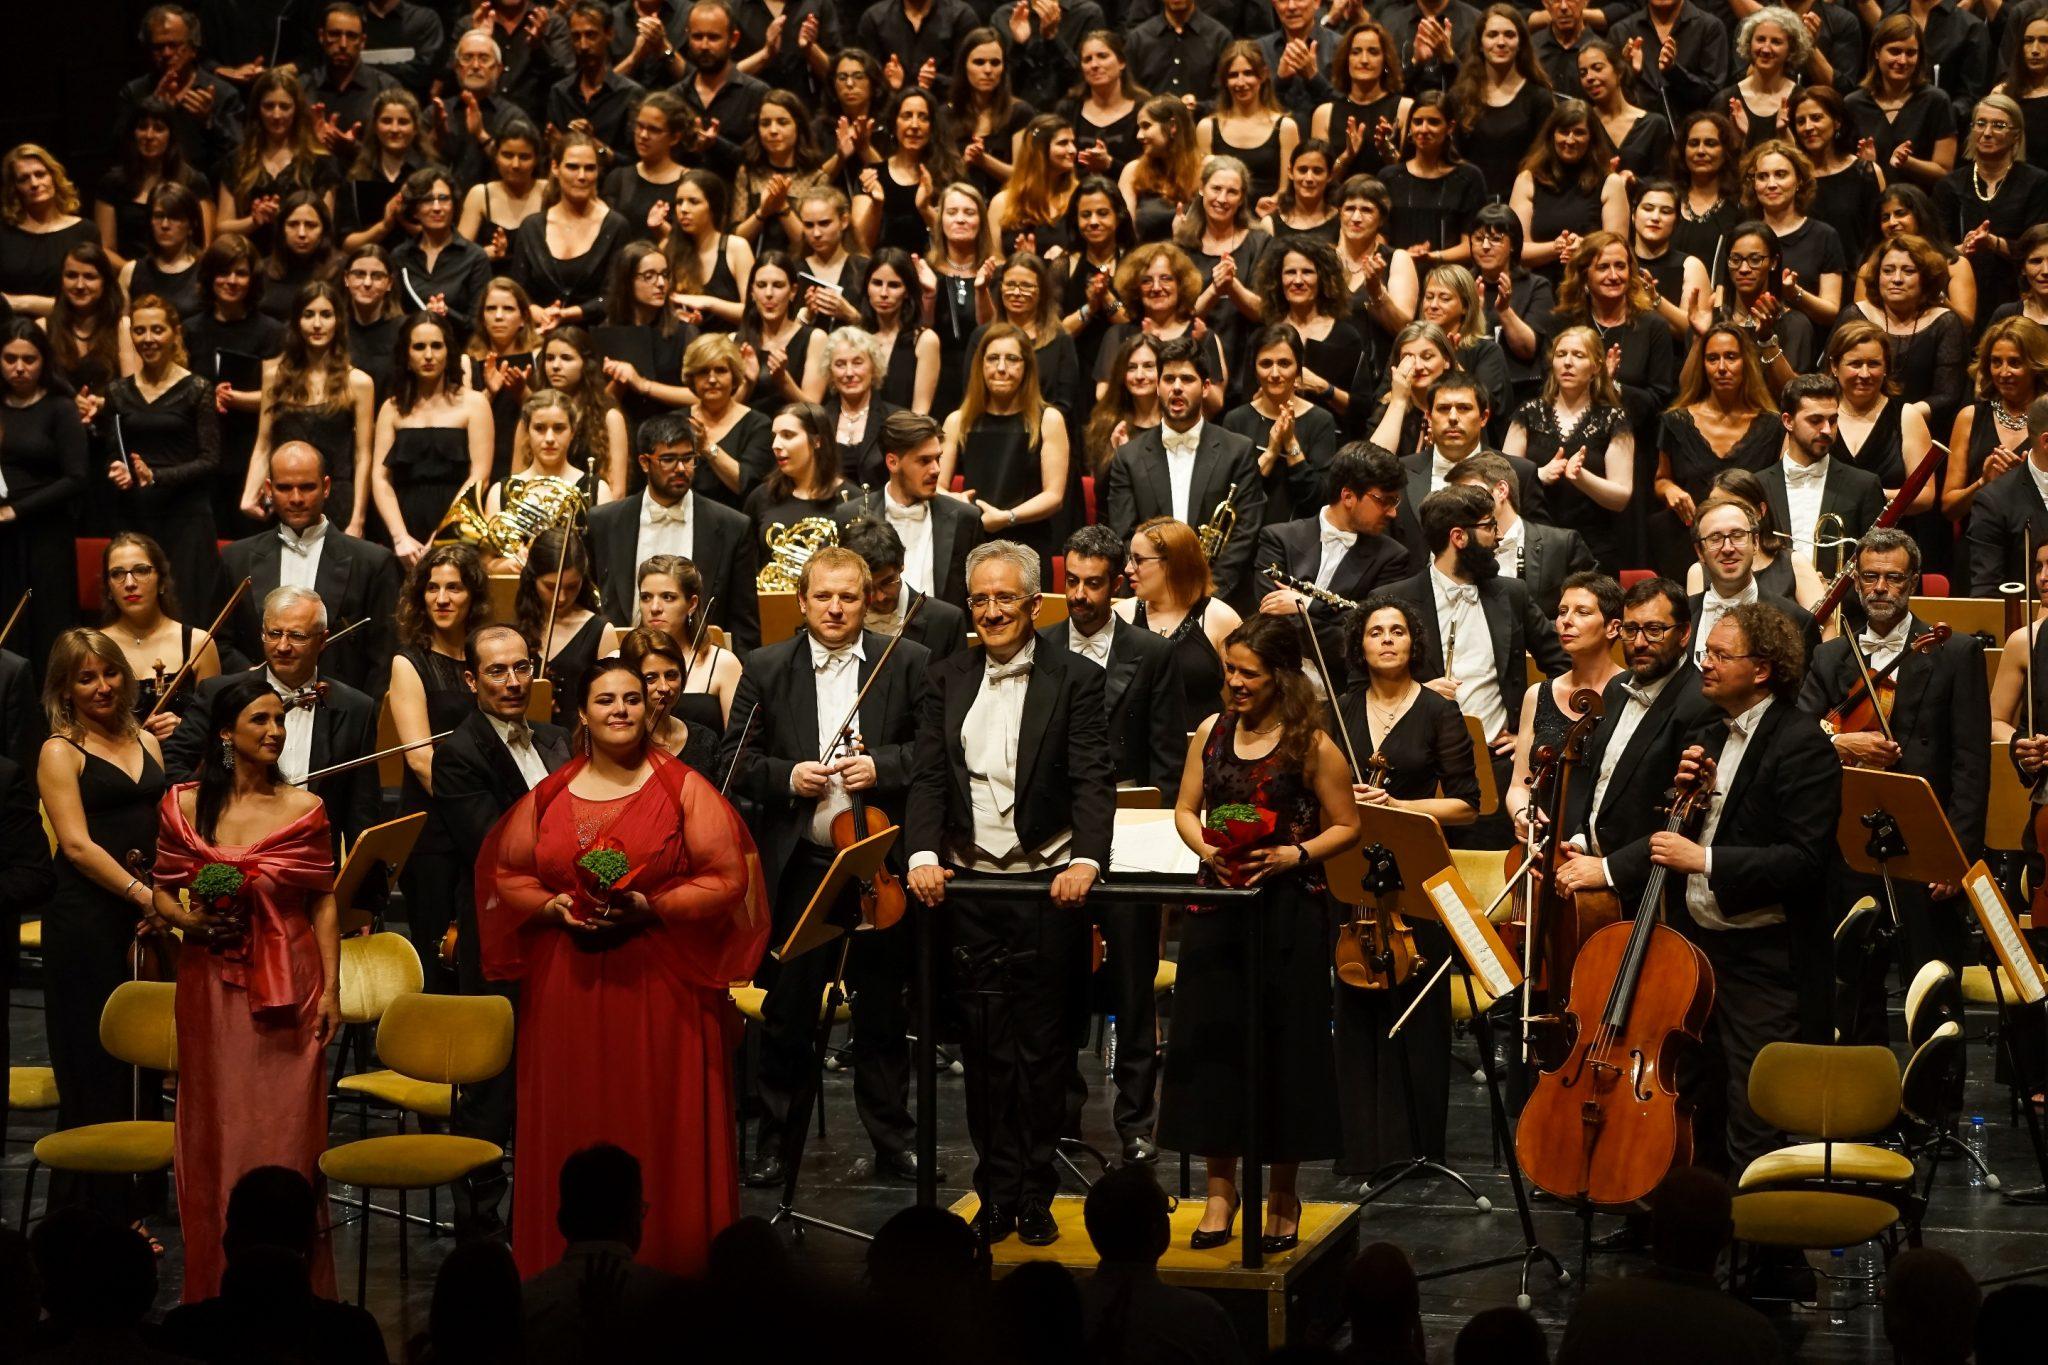 De frente para o observador, os participantes do concerto, incluindo coro, orquestra, maestro e solistas, encaram as palmas do público.